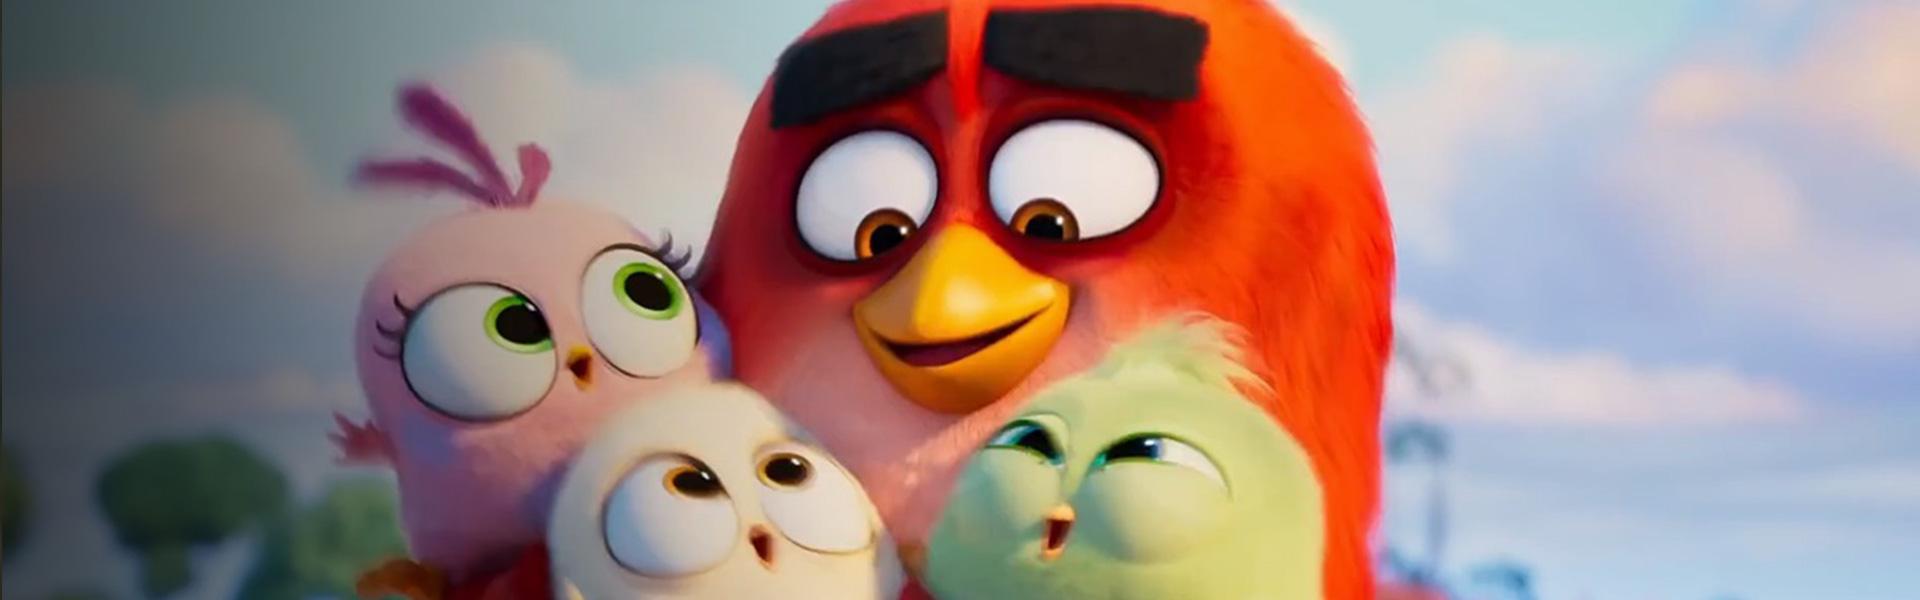 The Angry Birds Movie 2 – Minimax Cinema